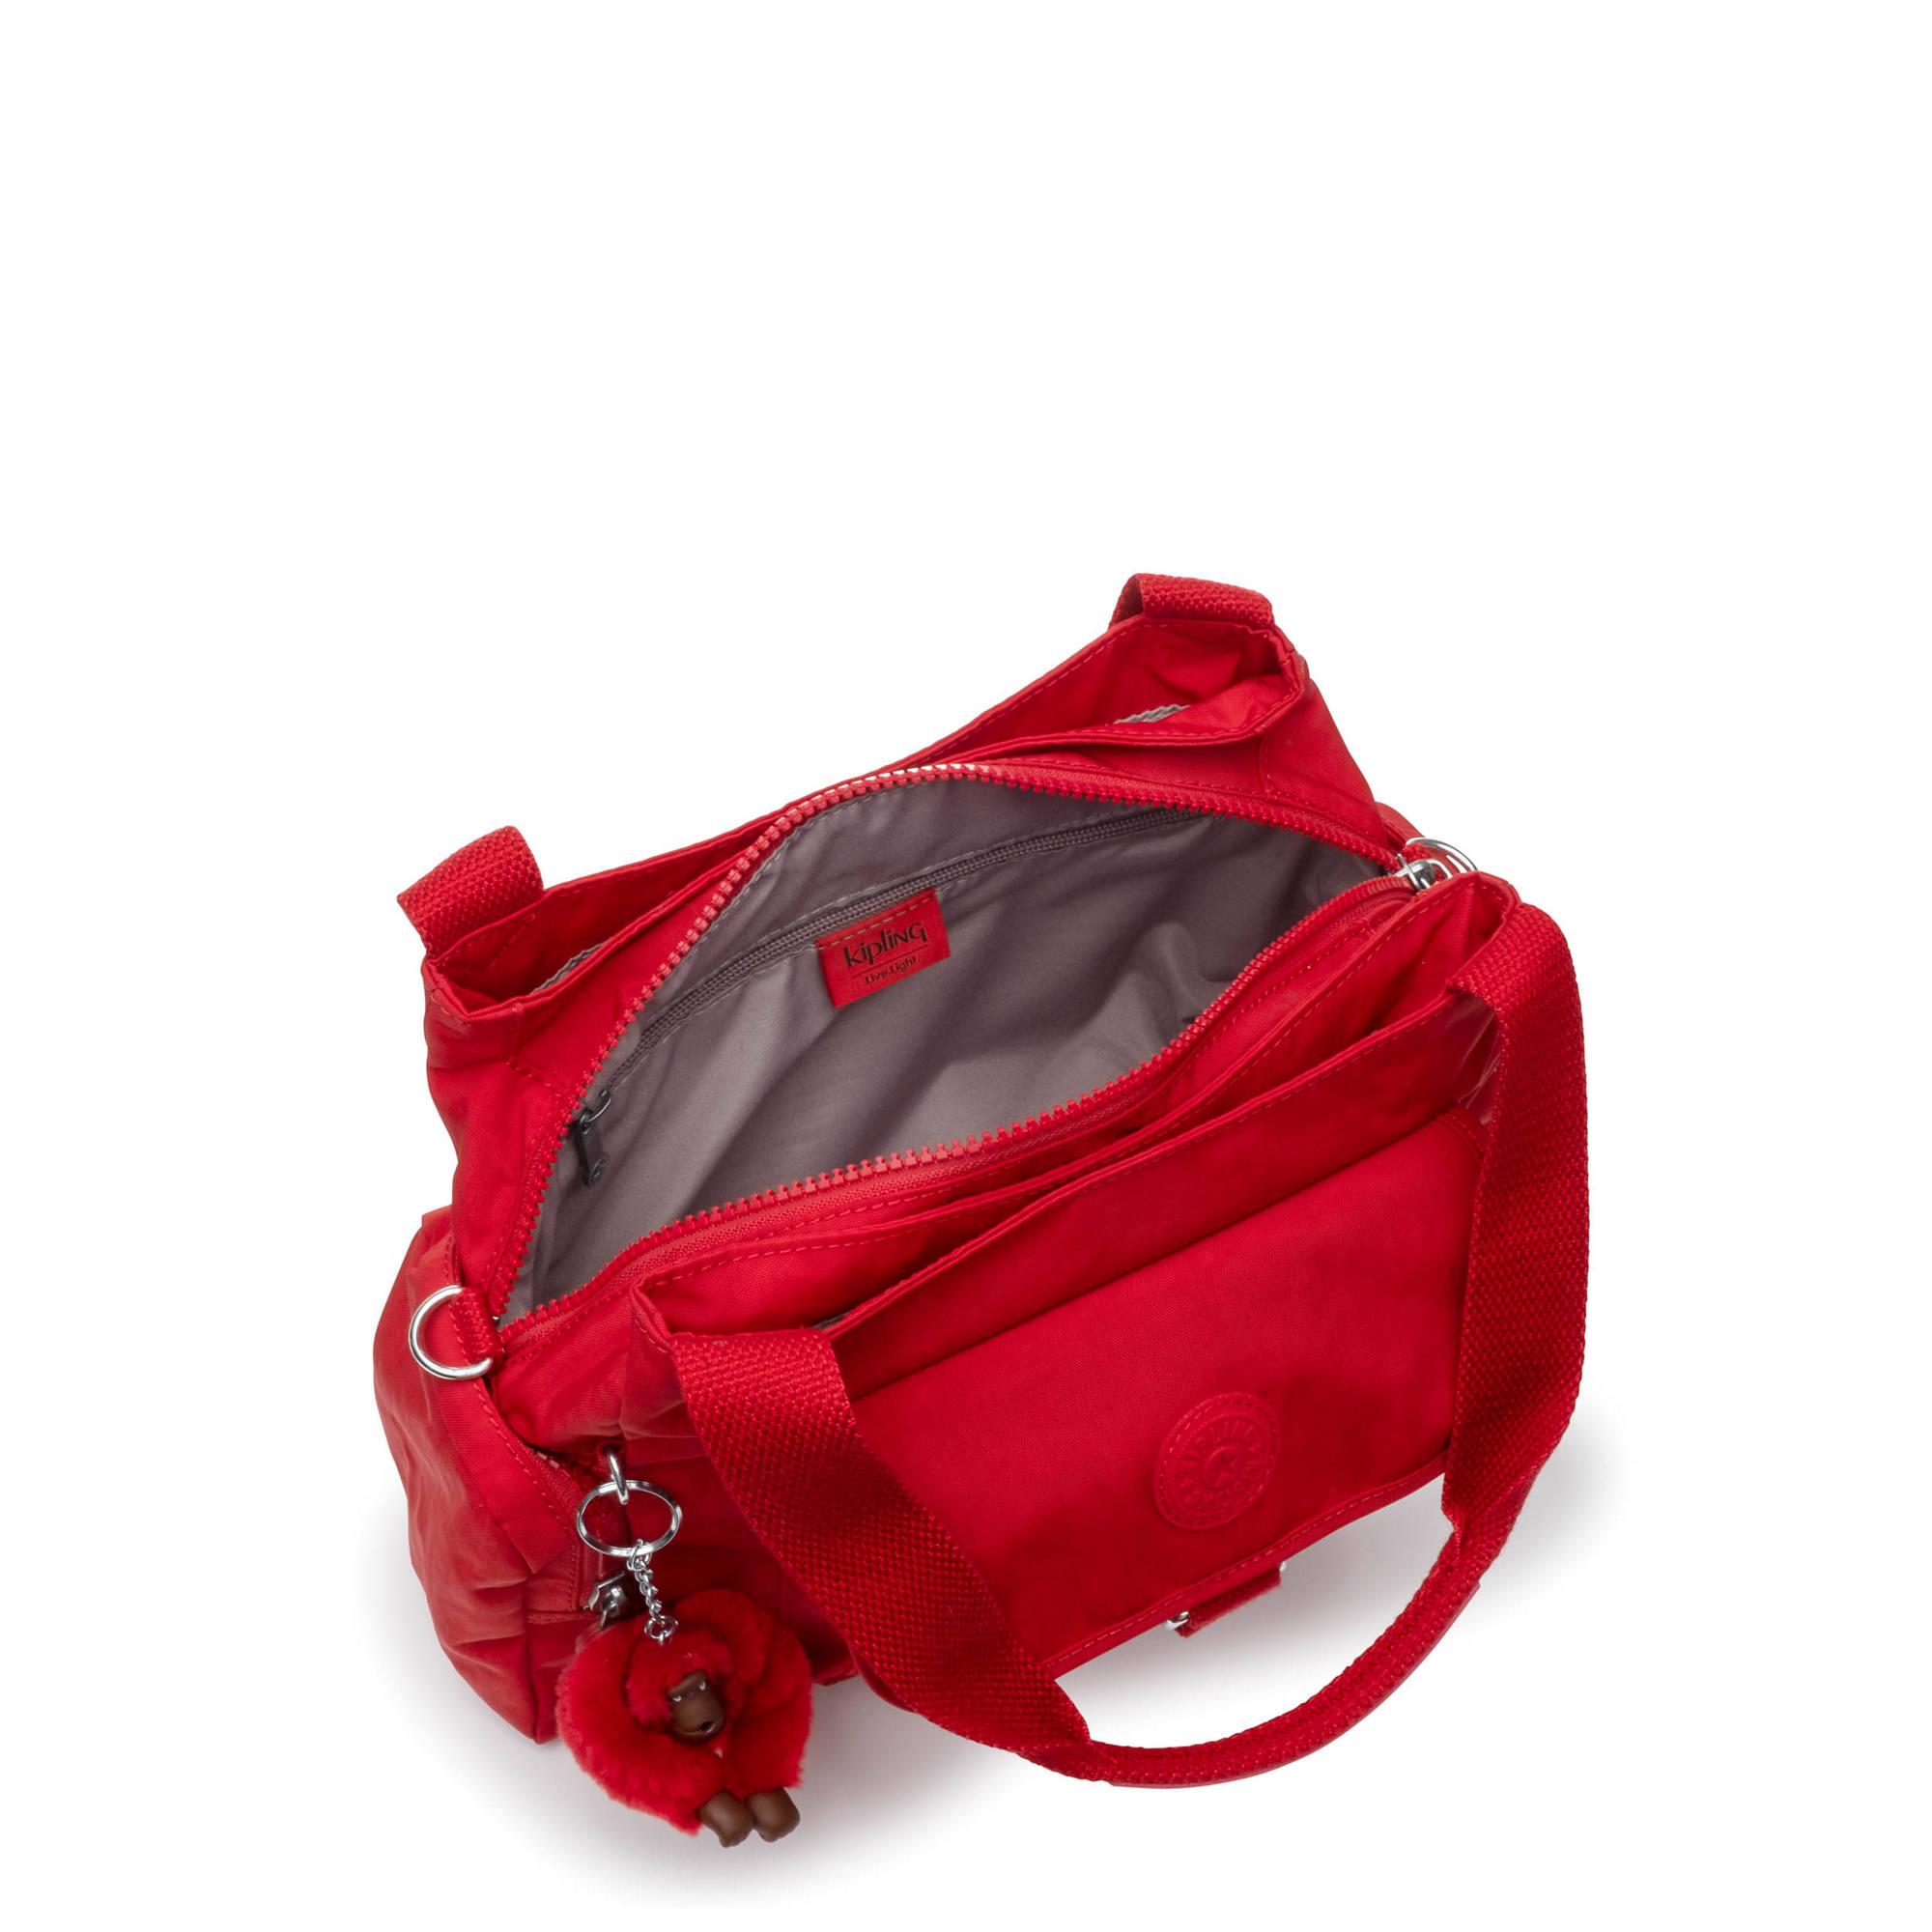 Kipling-Felix-Large-Handbag miniature 21